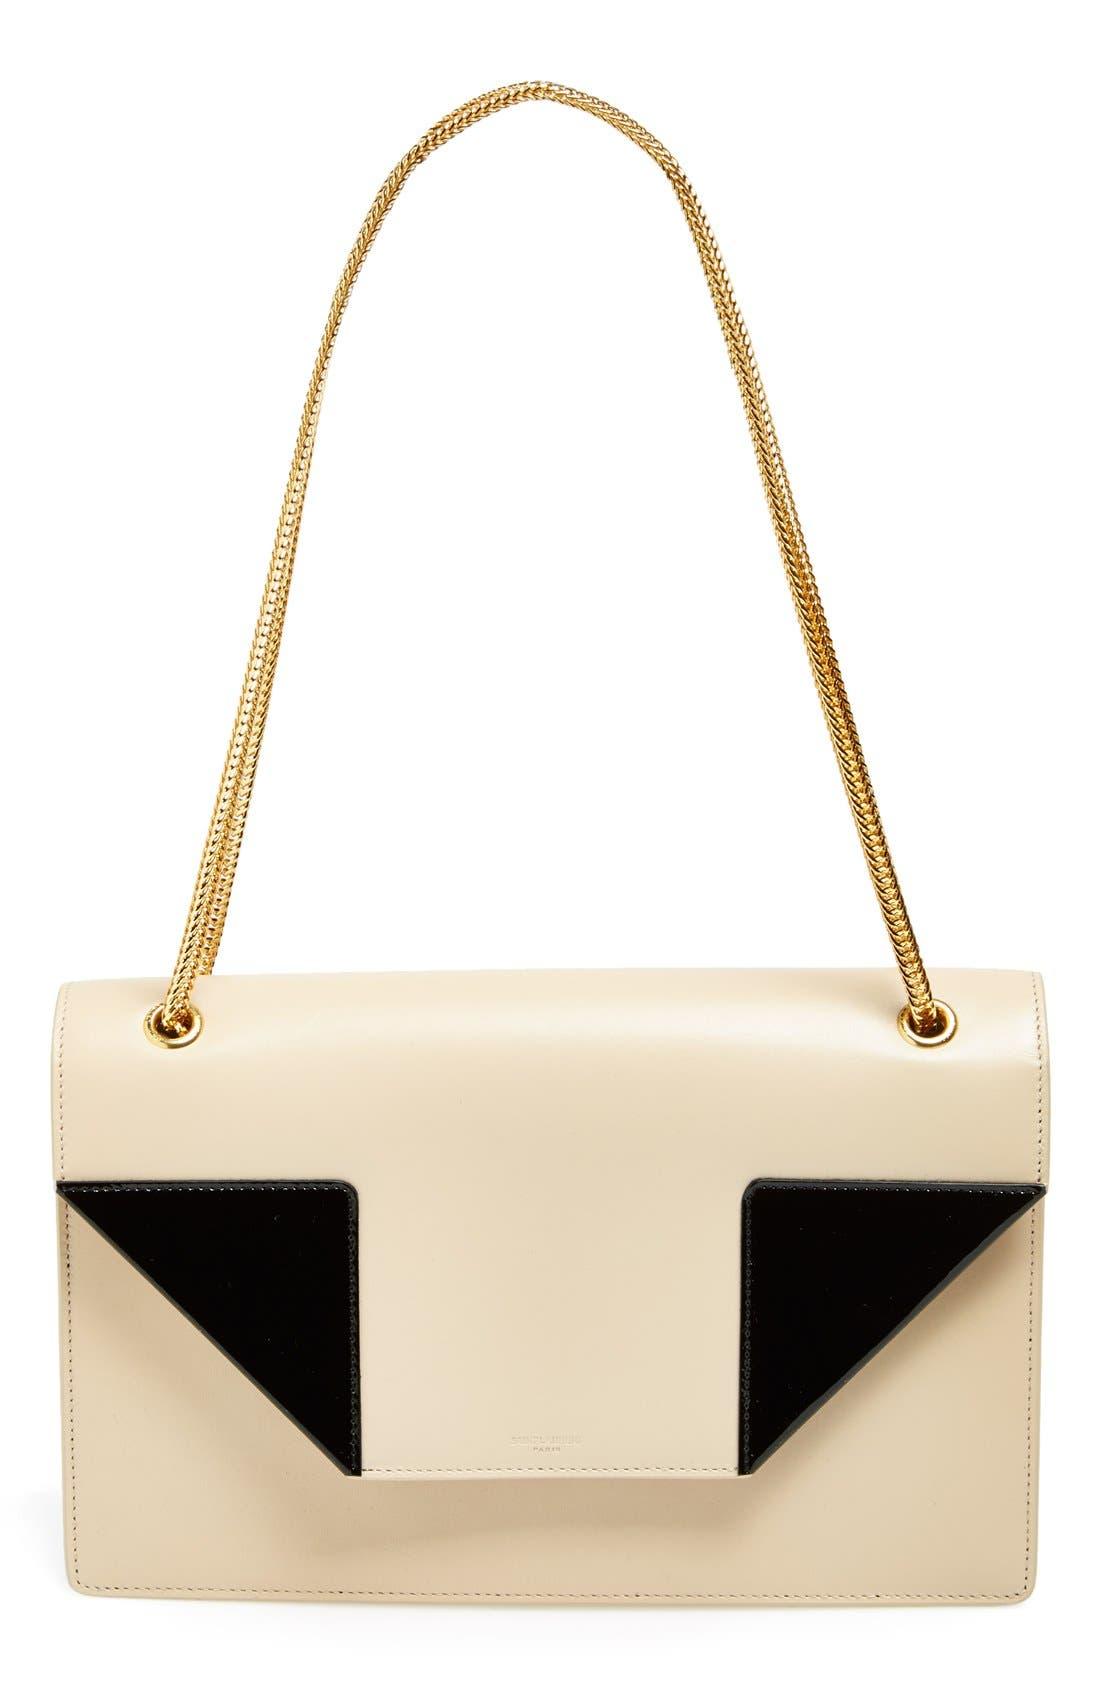 Main Image - Saint Laurent 'Medium Betty' Calfskin Shoulder Bag